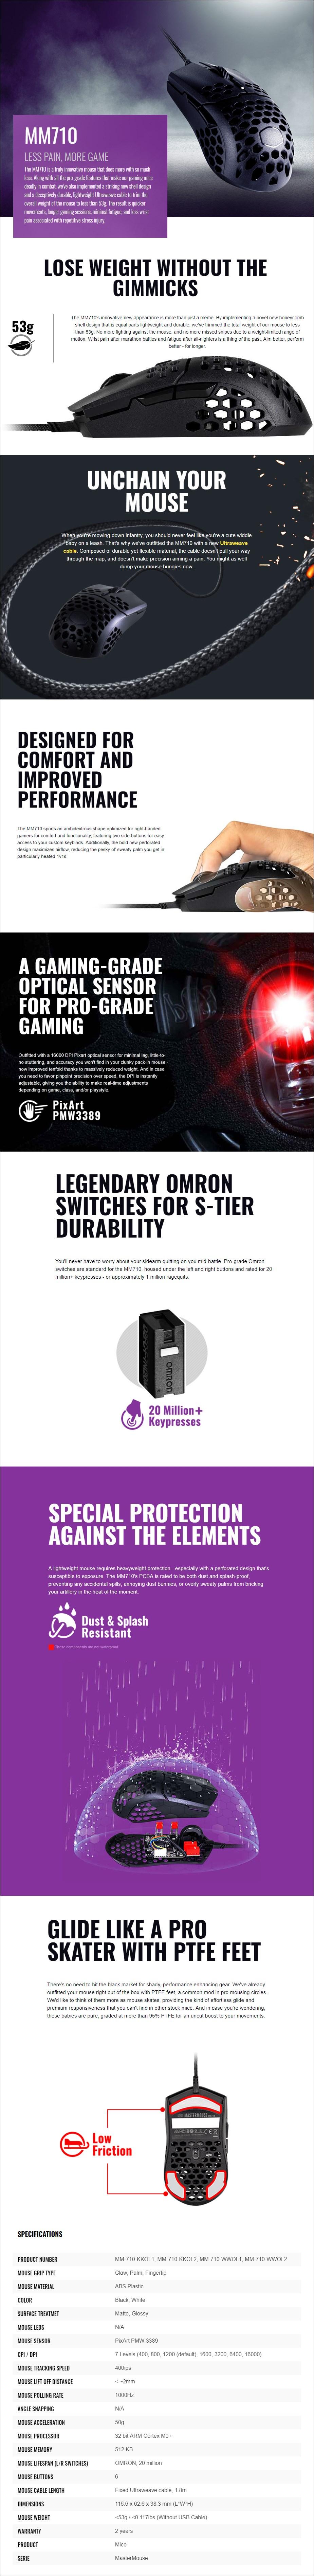 cooler-master-mm710-optical-gaming-mouse-matte-black-ac26140-8.jpg